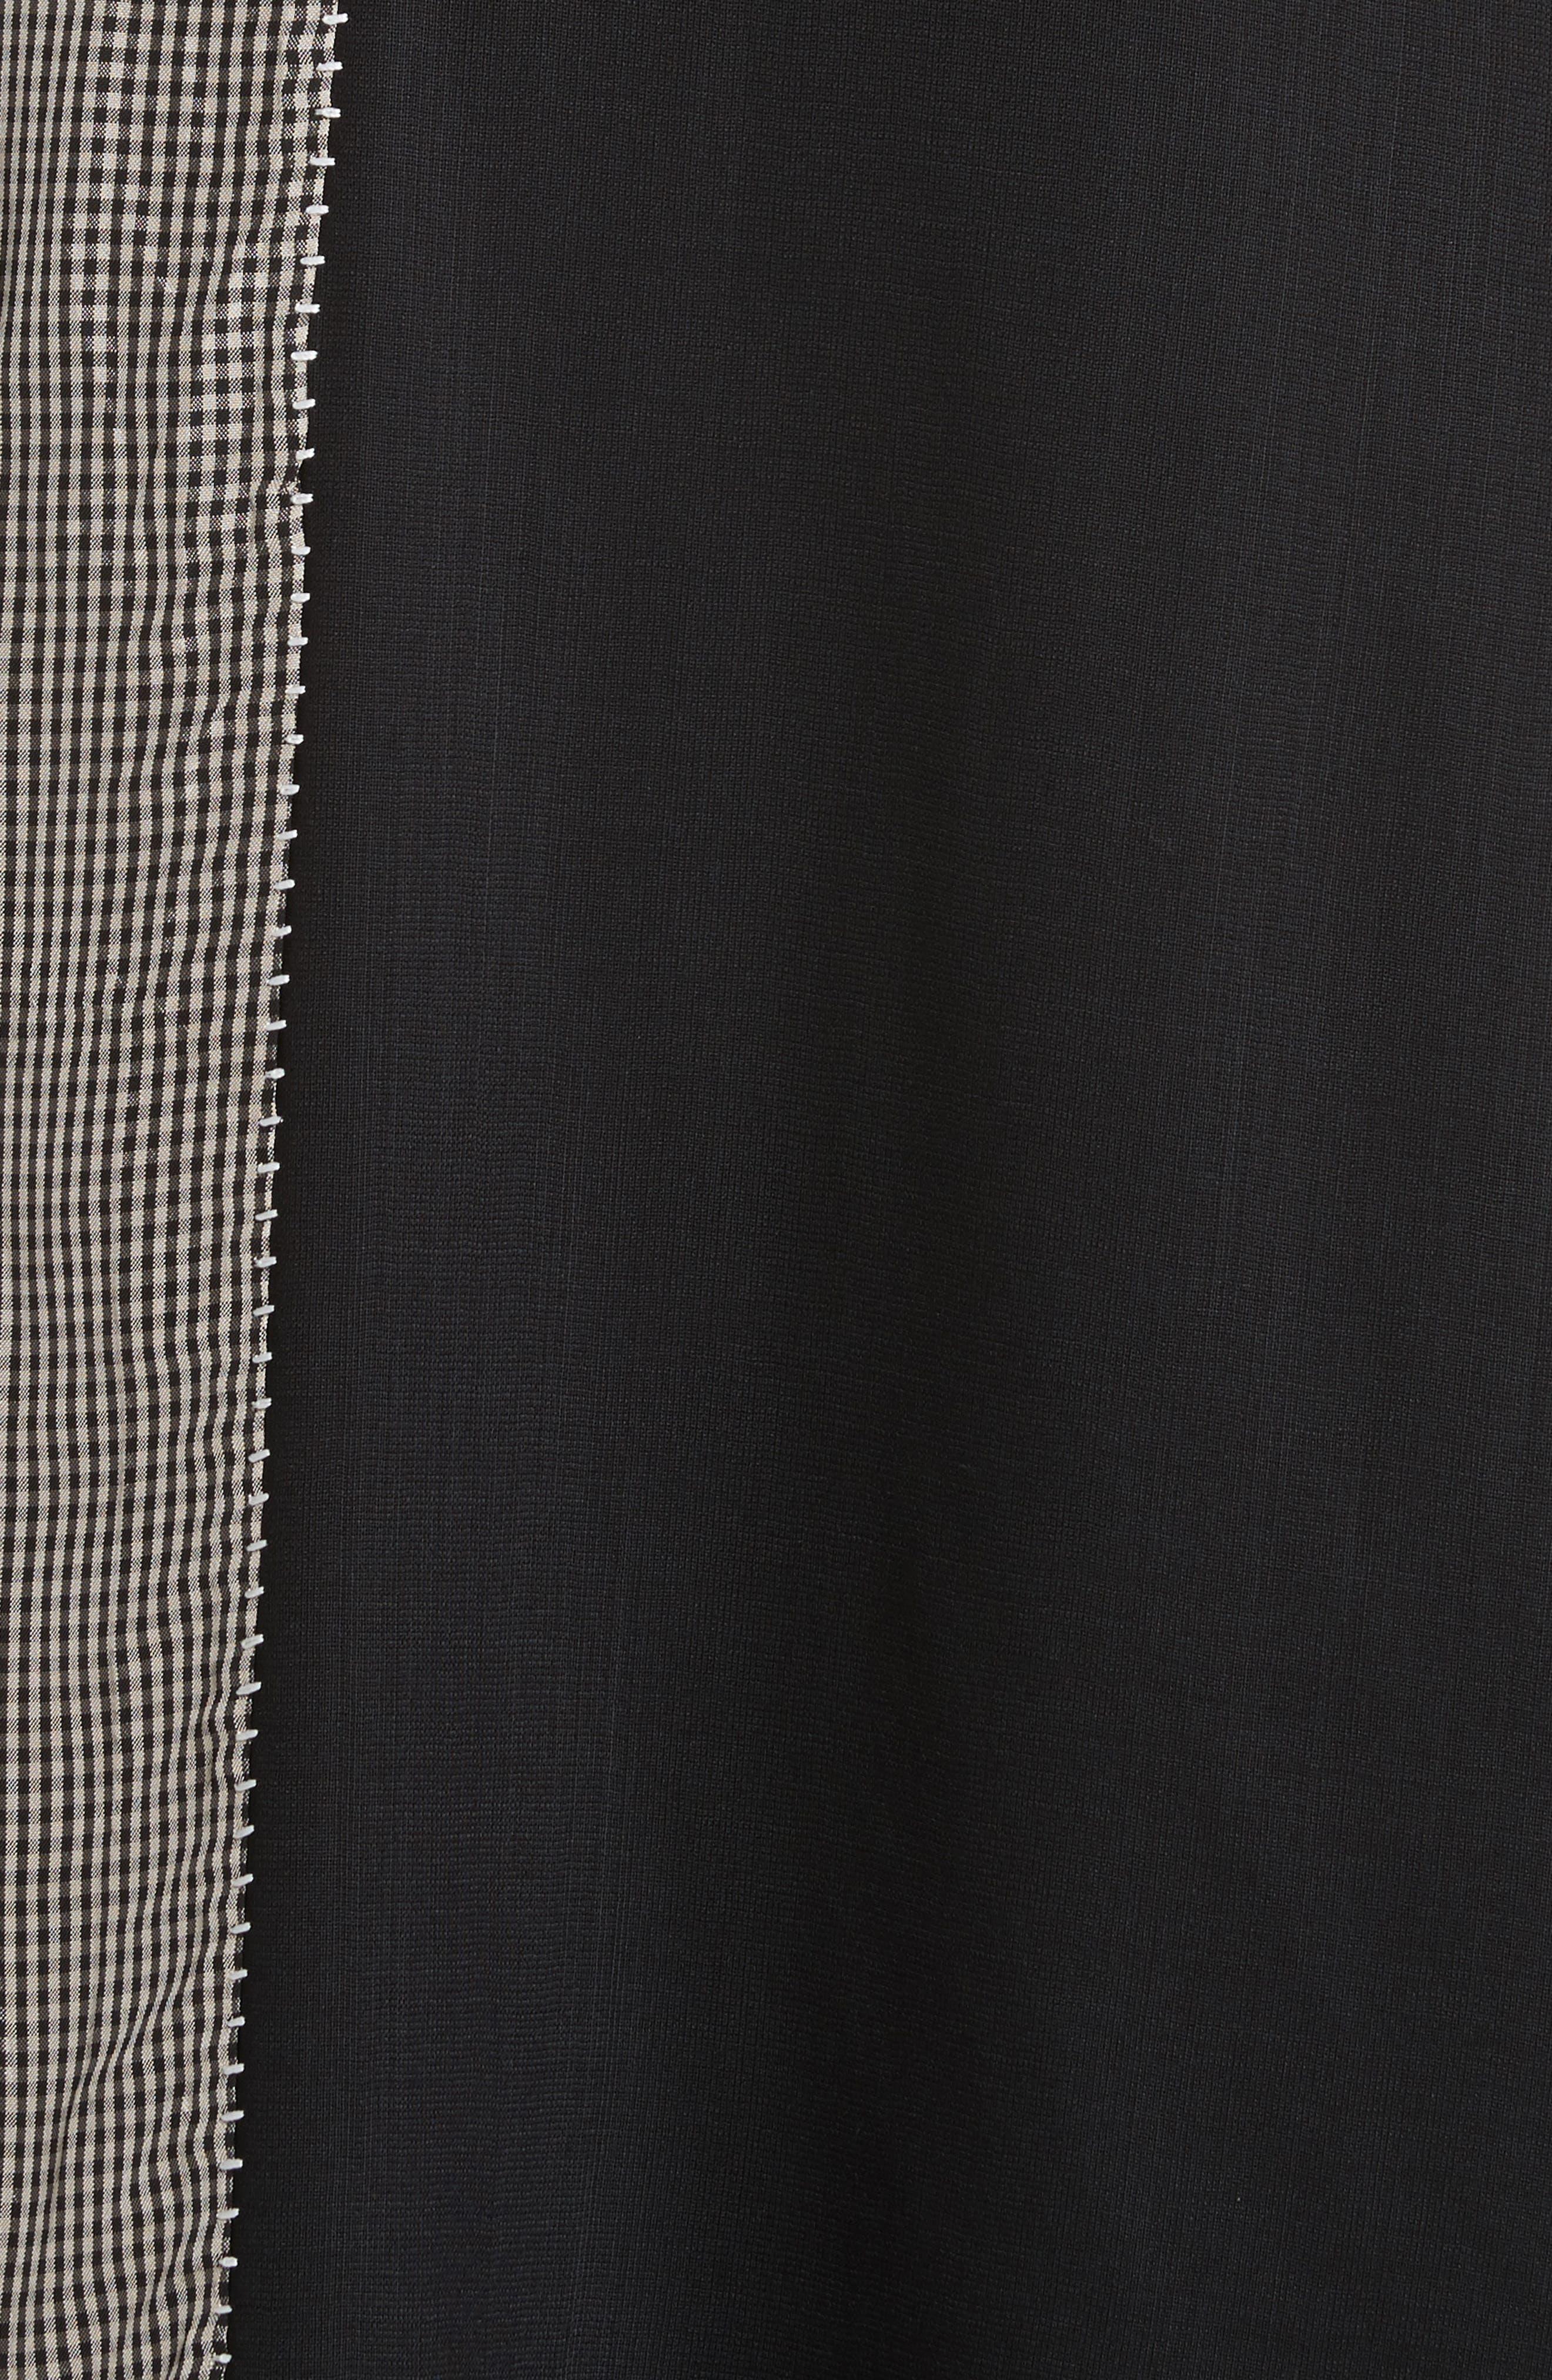 Dragica Mixed Media Dress,                             Alternate thumbnail 6, color,                             Black